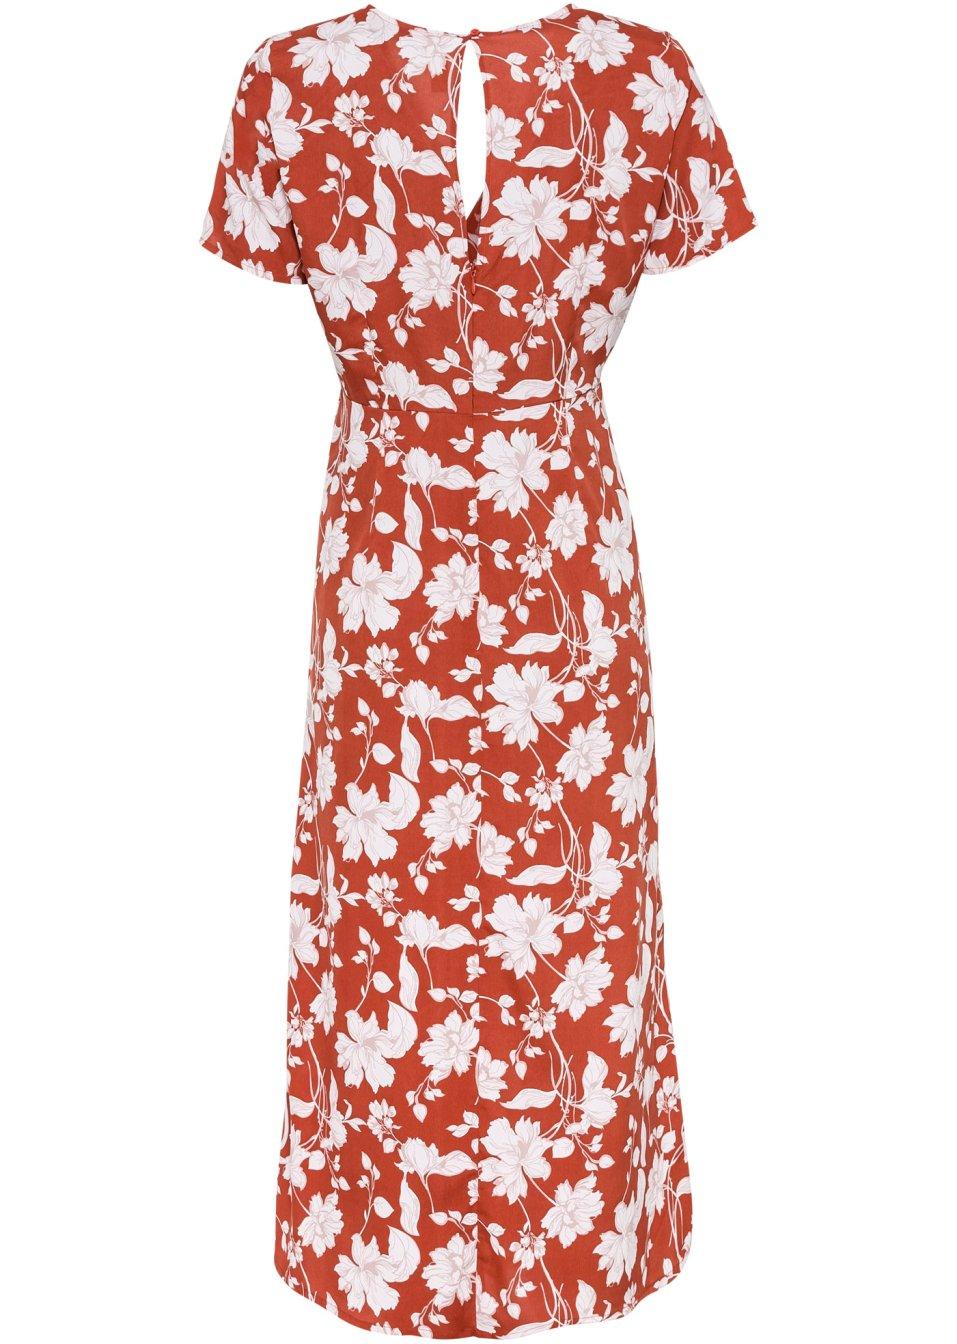 Mode Femme Vêtements DJLfdOFlkj Robe midi rouge/blanc imprimé Femme RAINBOW .fr